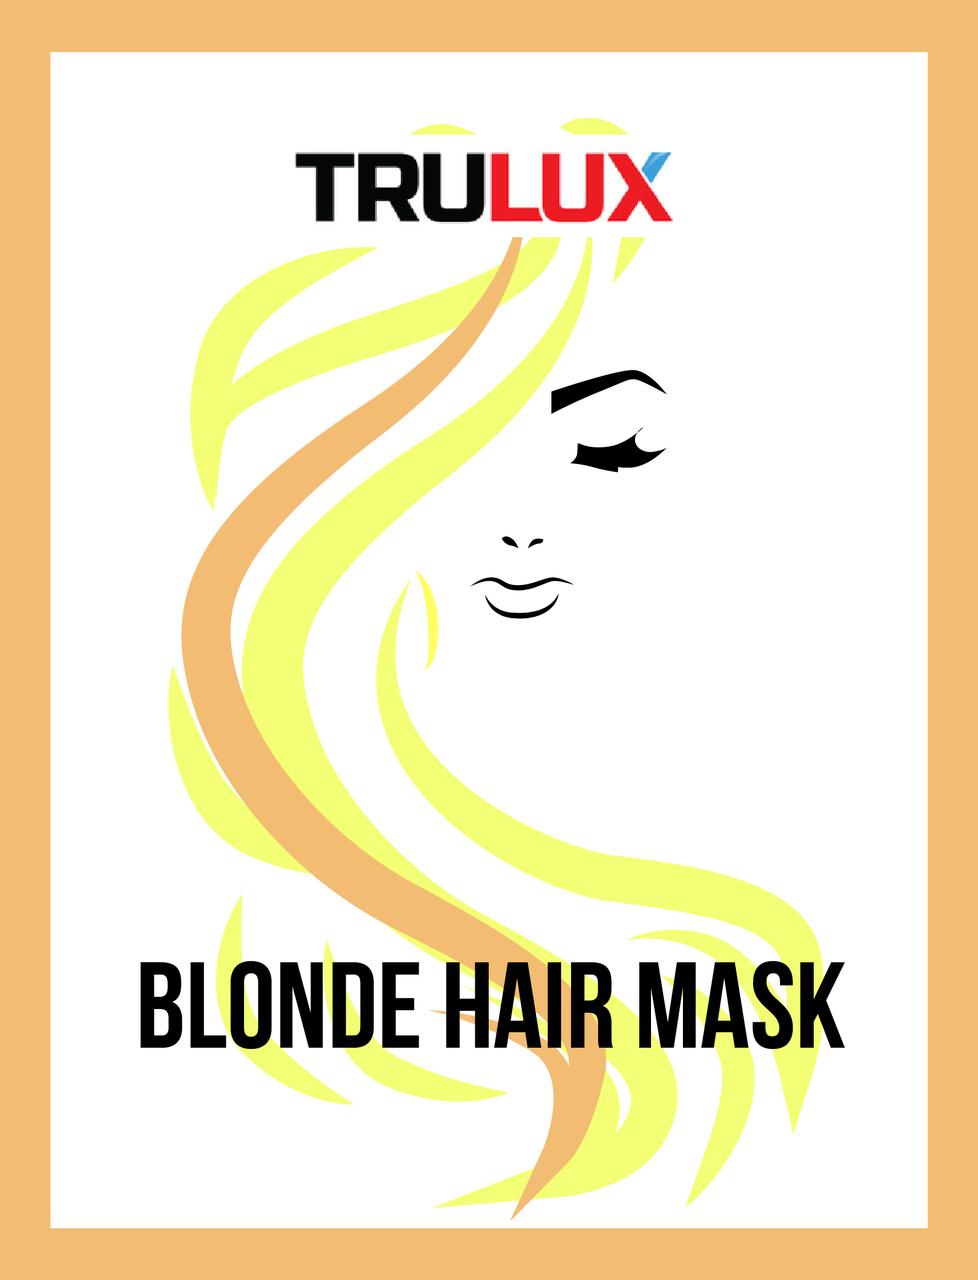 BLONDE HAIR MASK